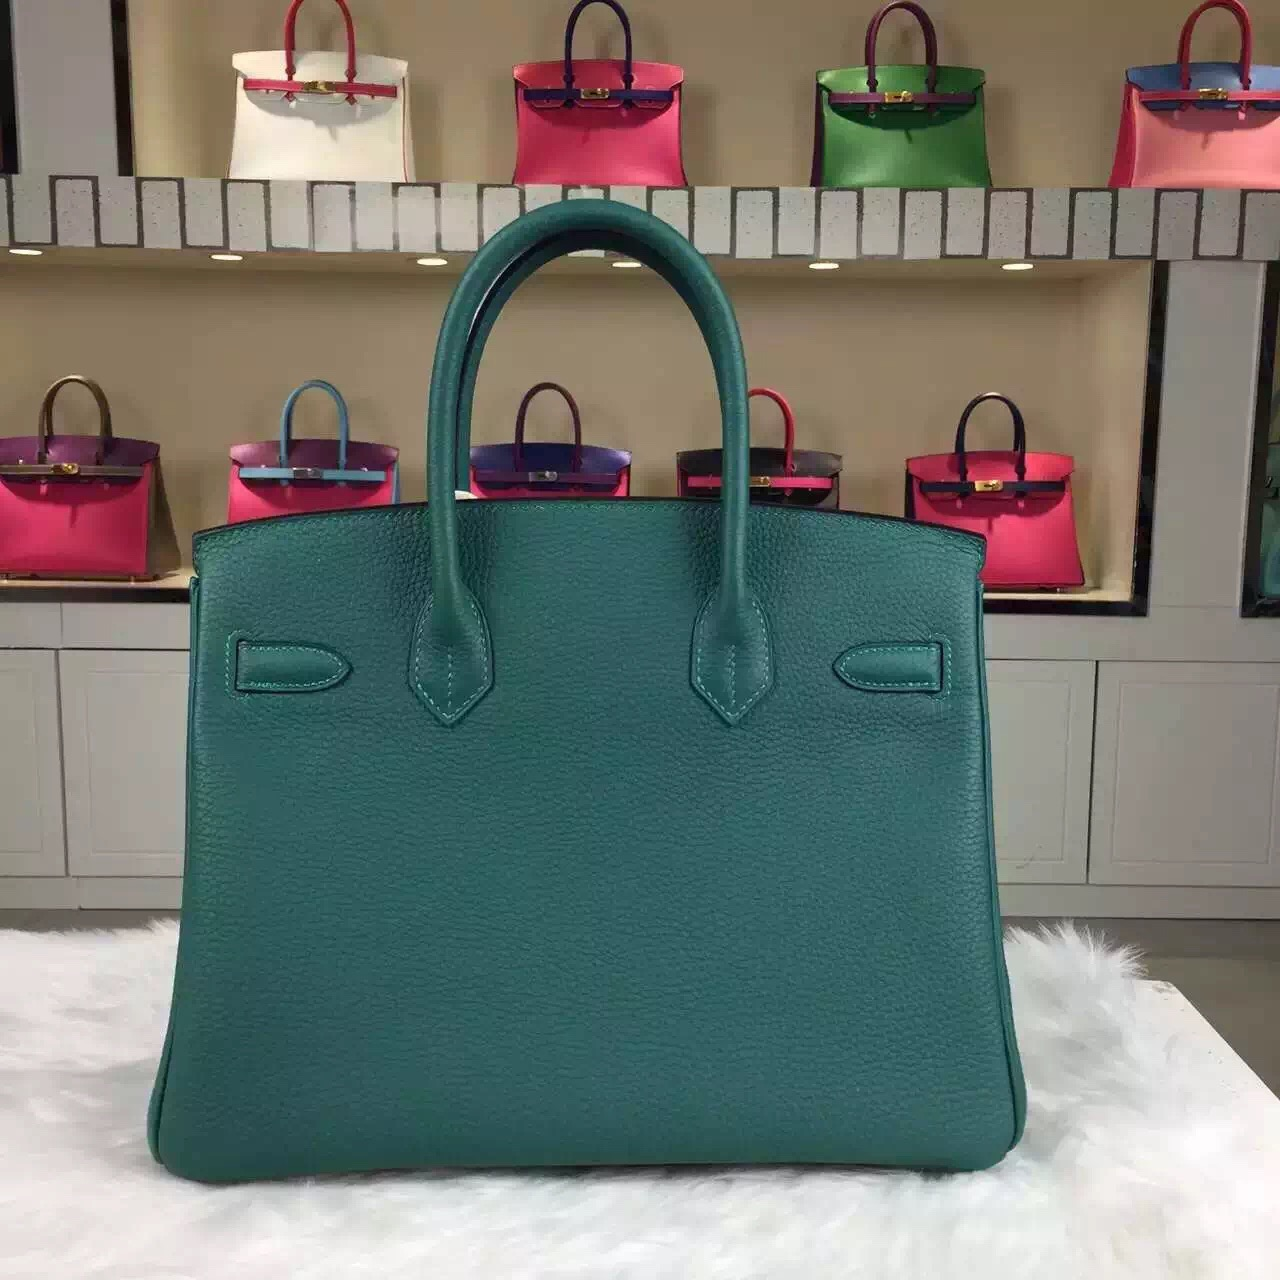 Discount Hermes Z6 Malachite Green France Togo Leather Birkin Bag30cm